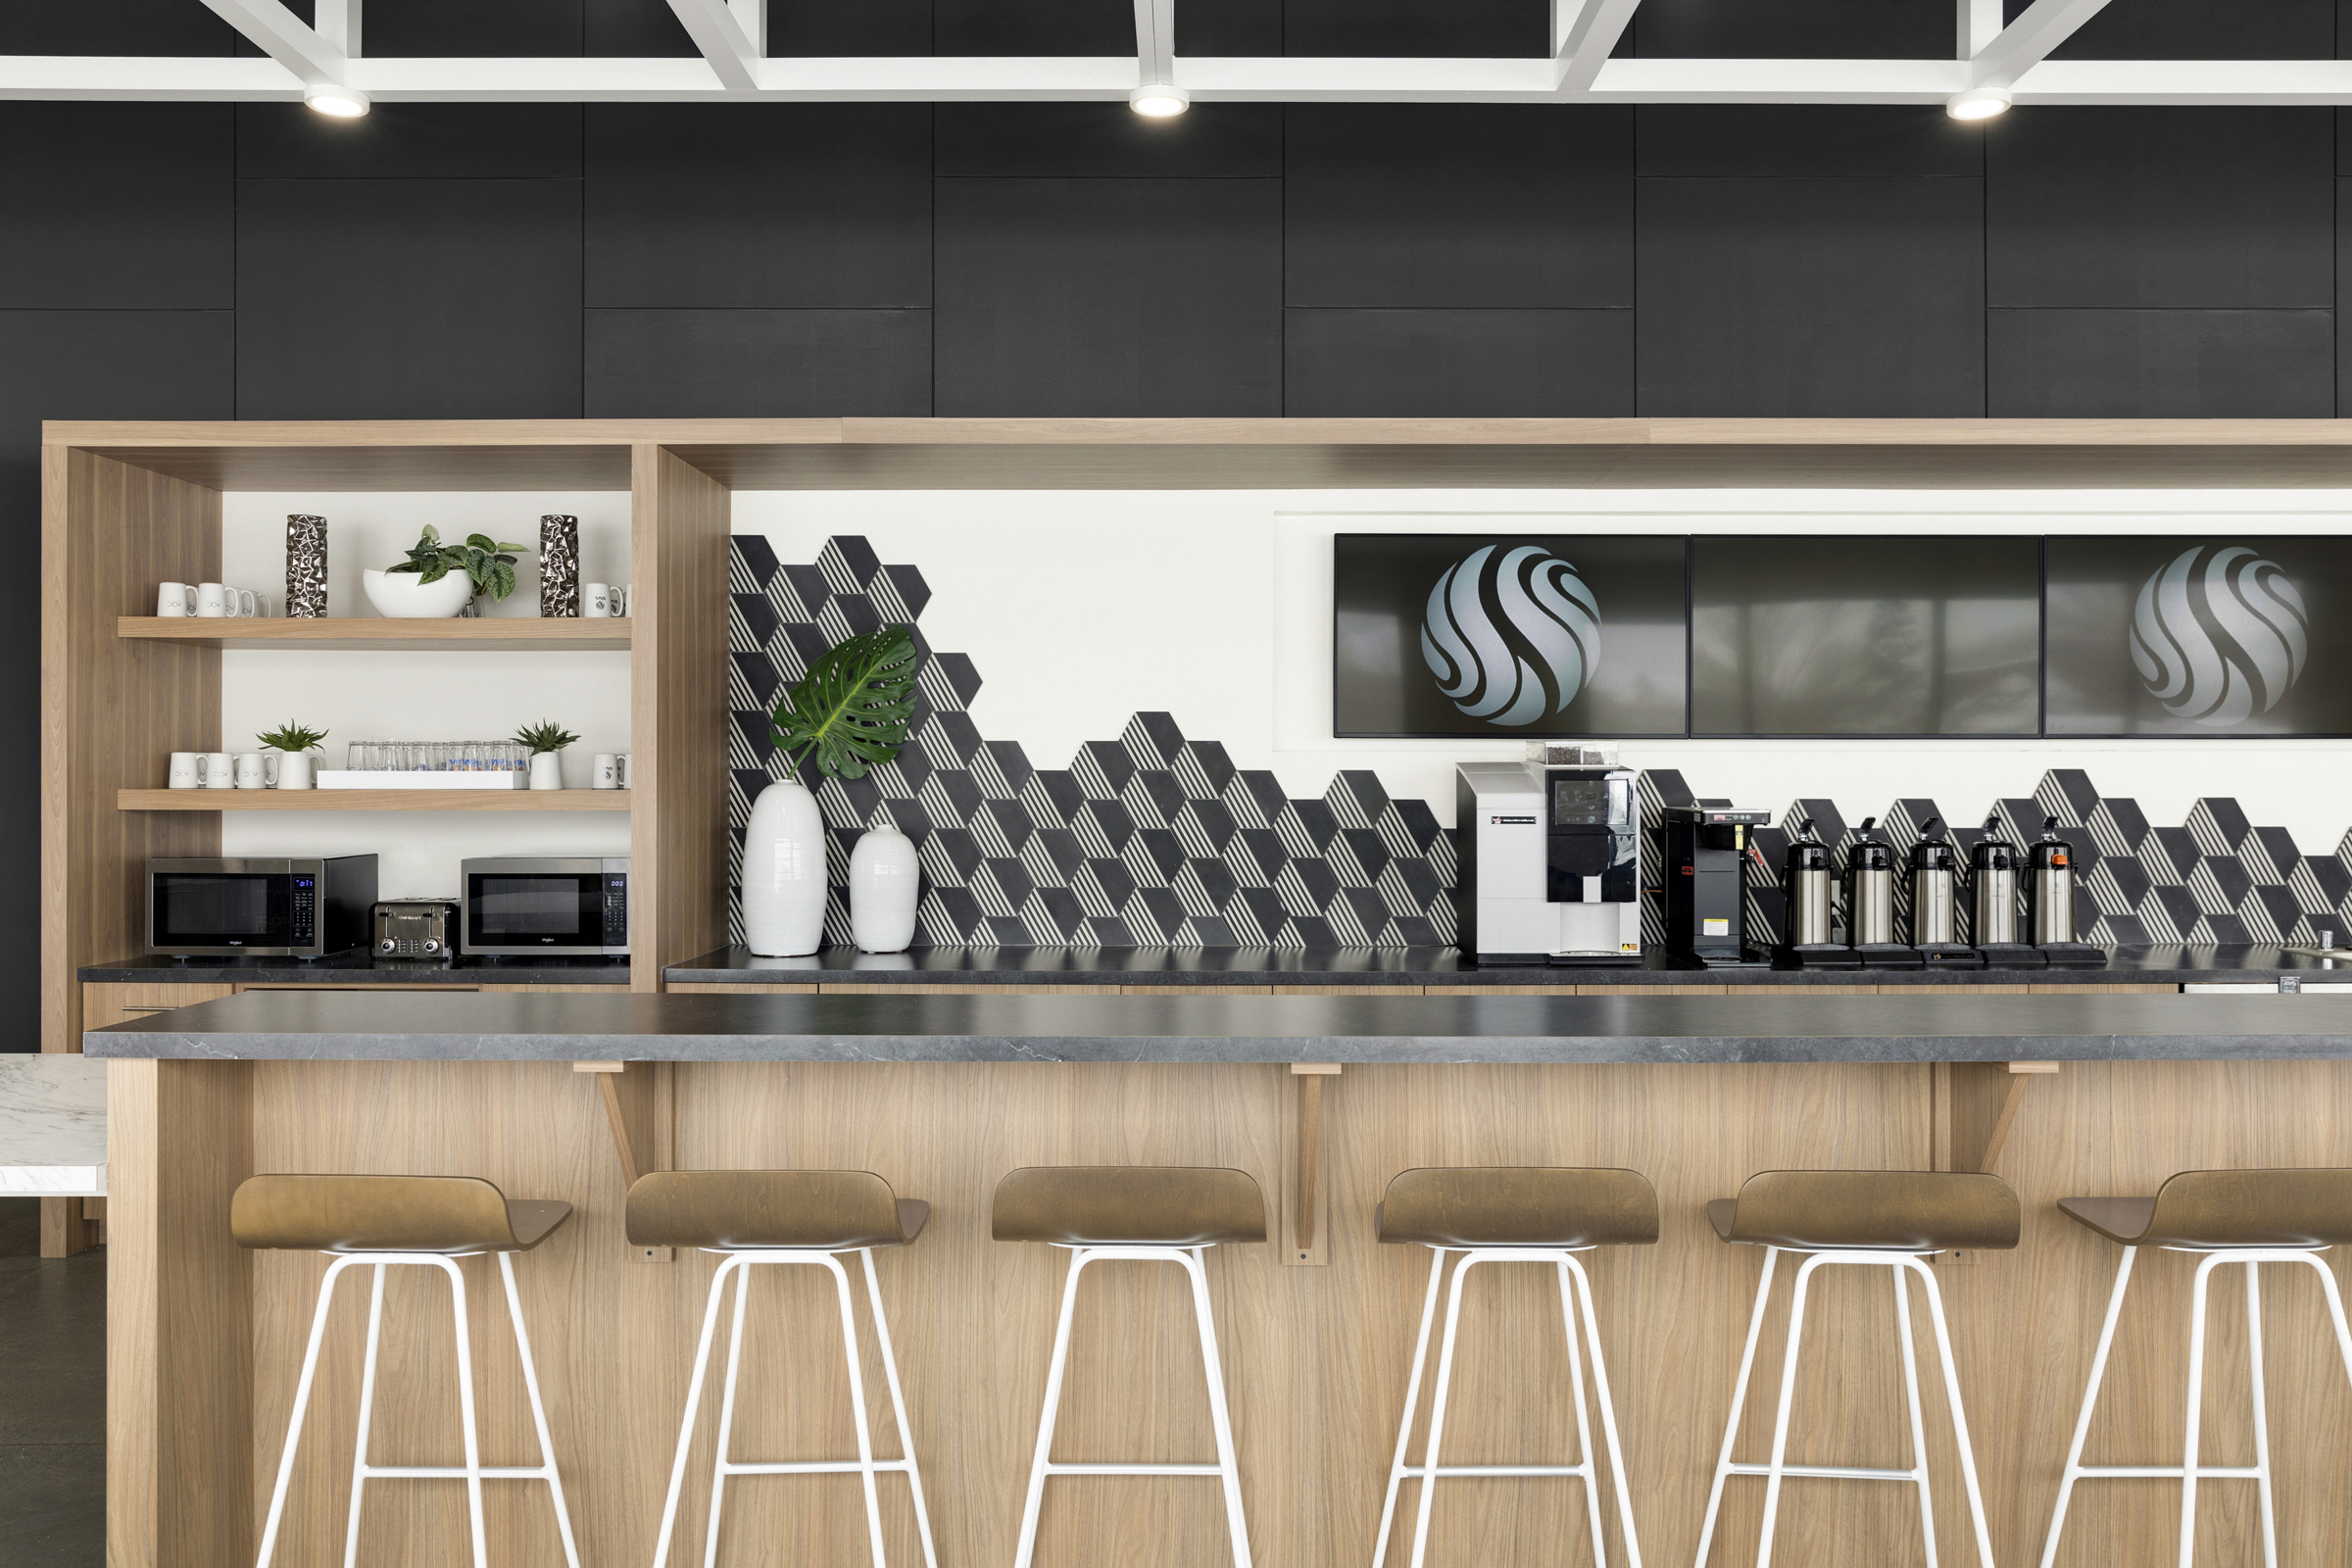 Kitchenette Design | Vela Creative Interior Design | Minneapolis